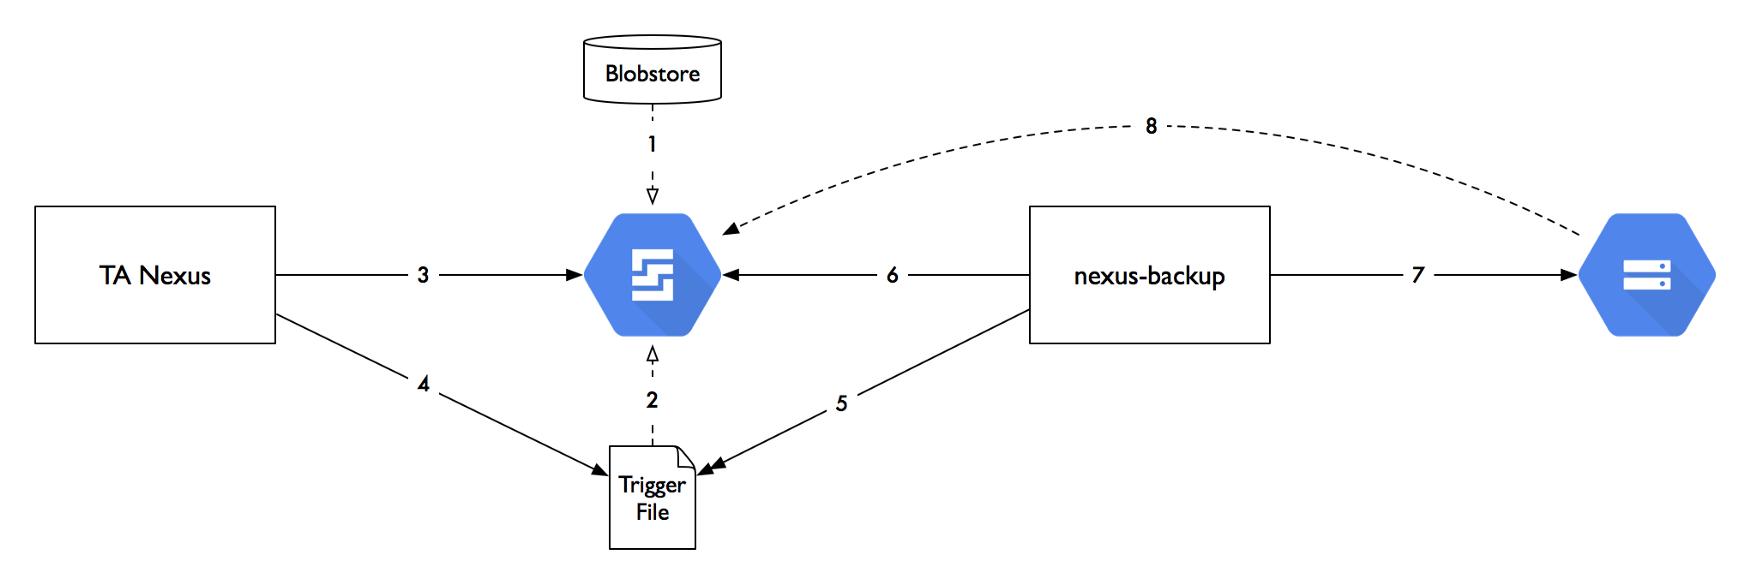 travel audience - Sonatype Nexus on top of Google Cloud Platform